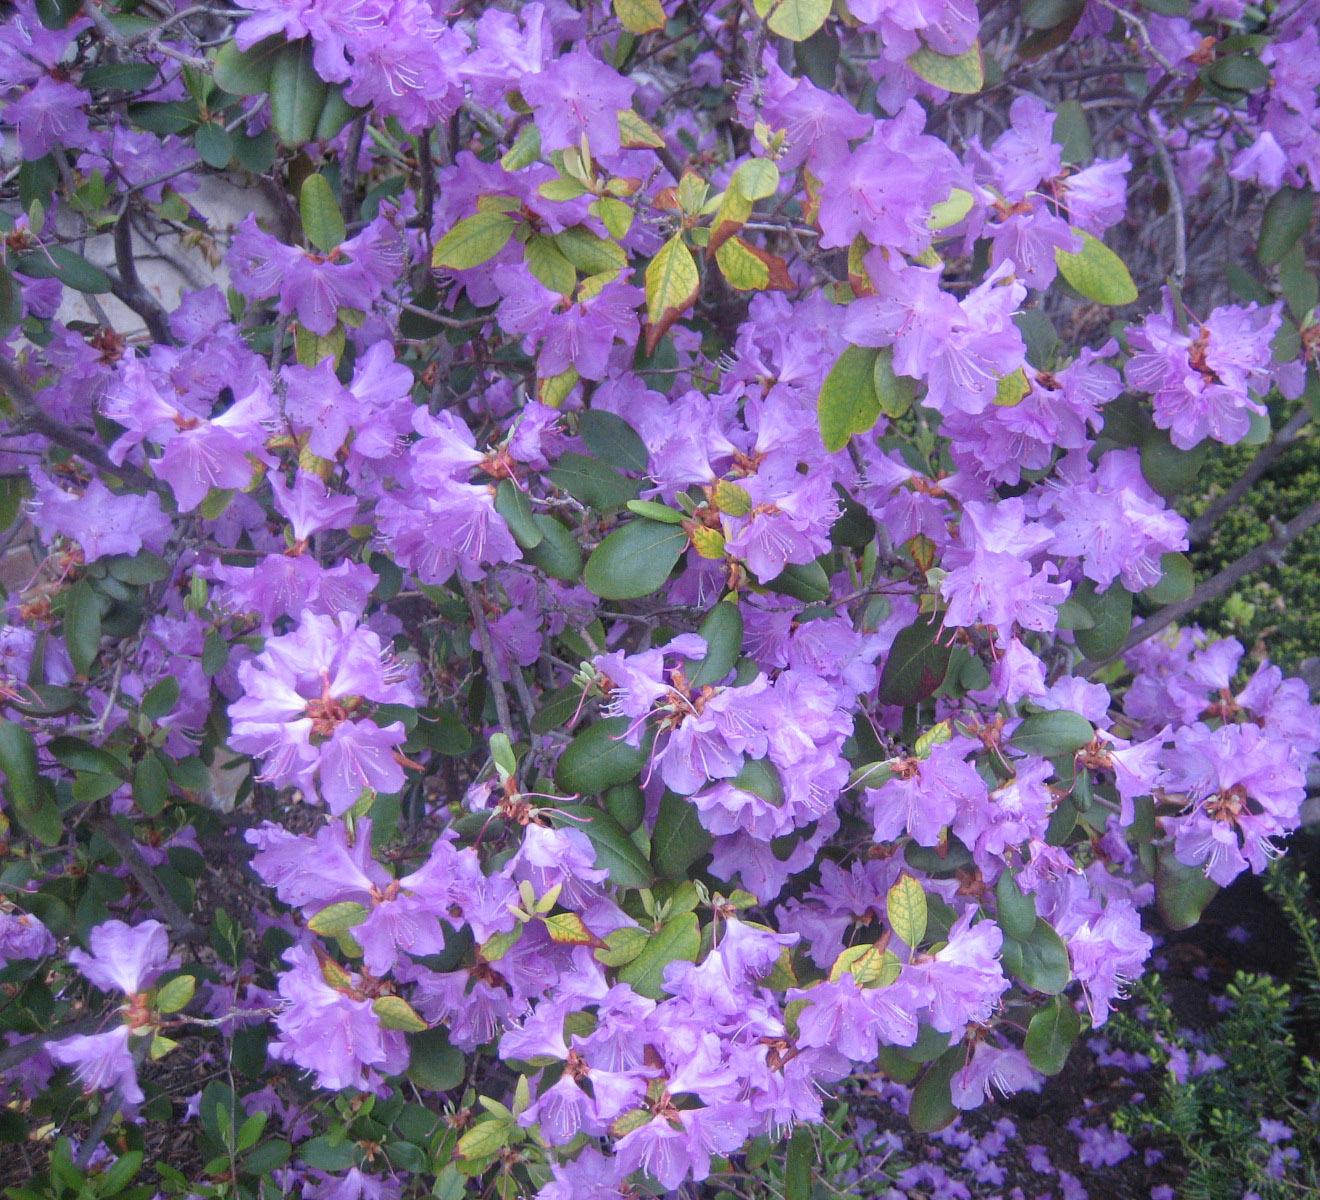 Purple Flowering Plant by elbarto252 on DeviantArt